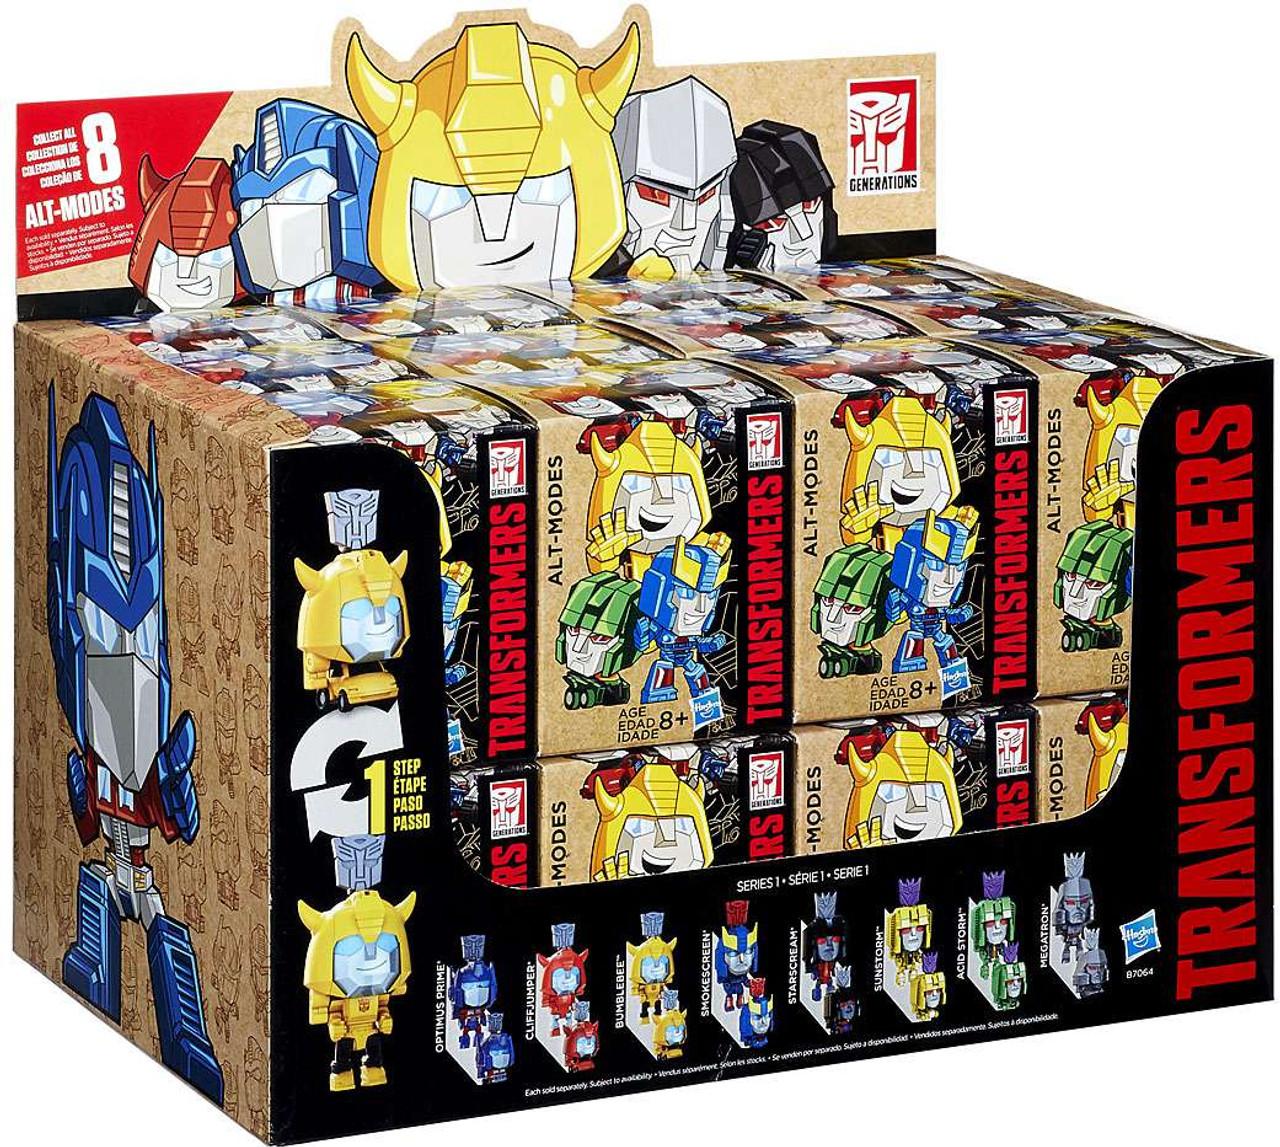 Transformers Generations Alt-Modes Series 3 Megatron